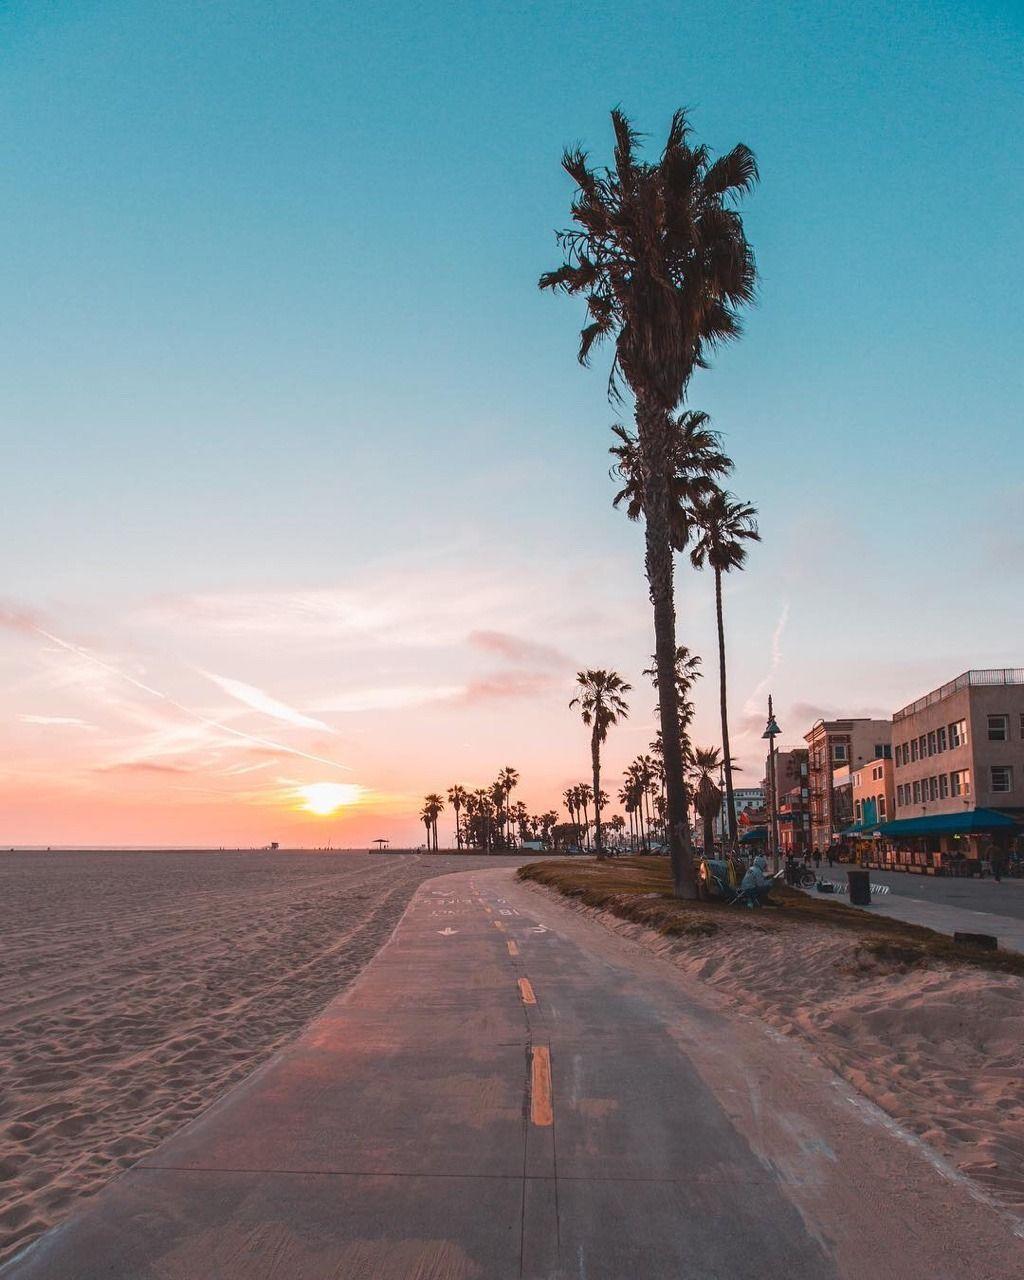 Los Angeles California By Deb0 By Californiafeelings Com California Cali La Ca Sf Sandiego Nature Photography Photo Scenery